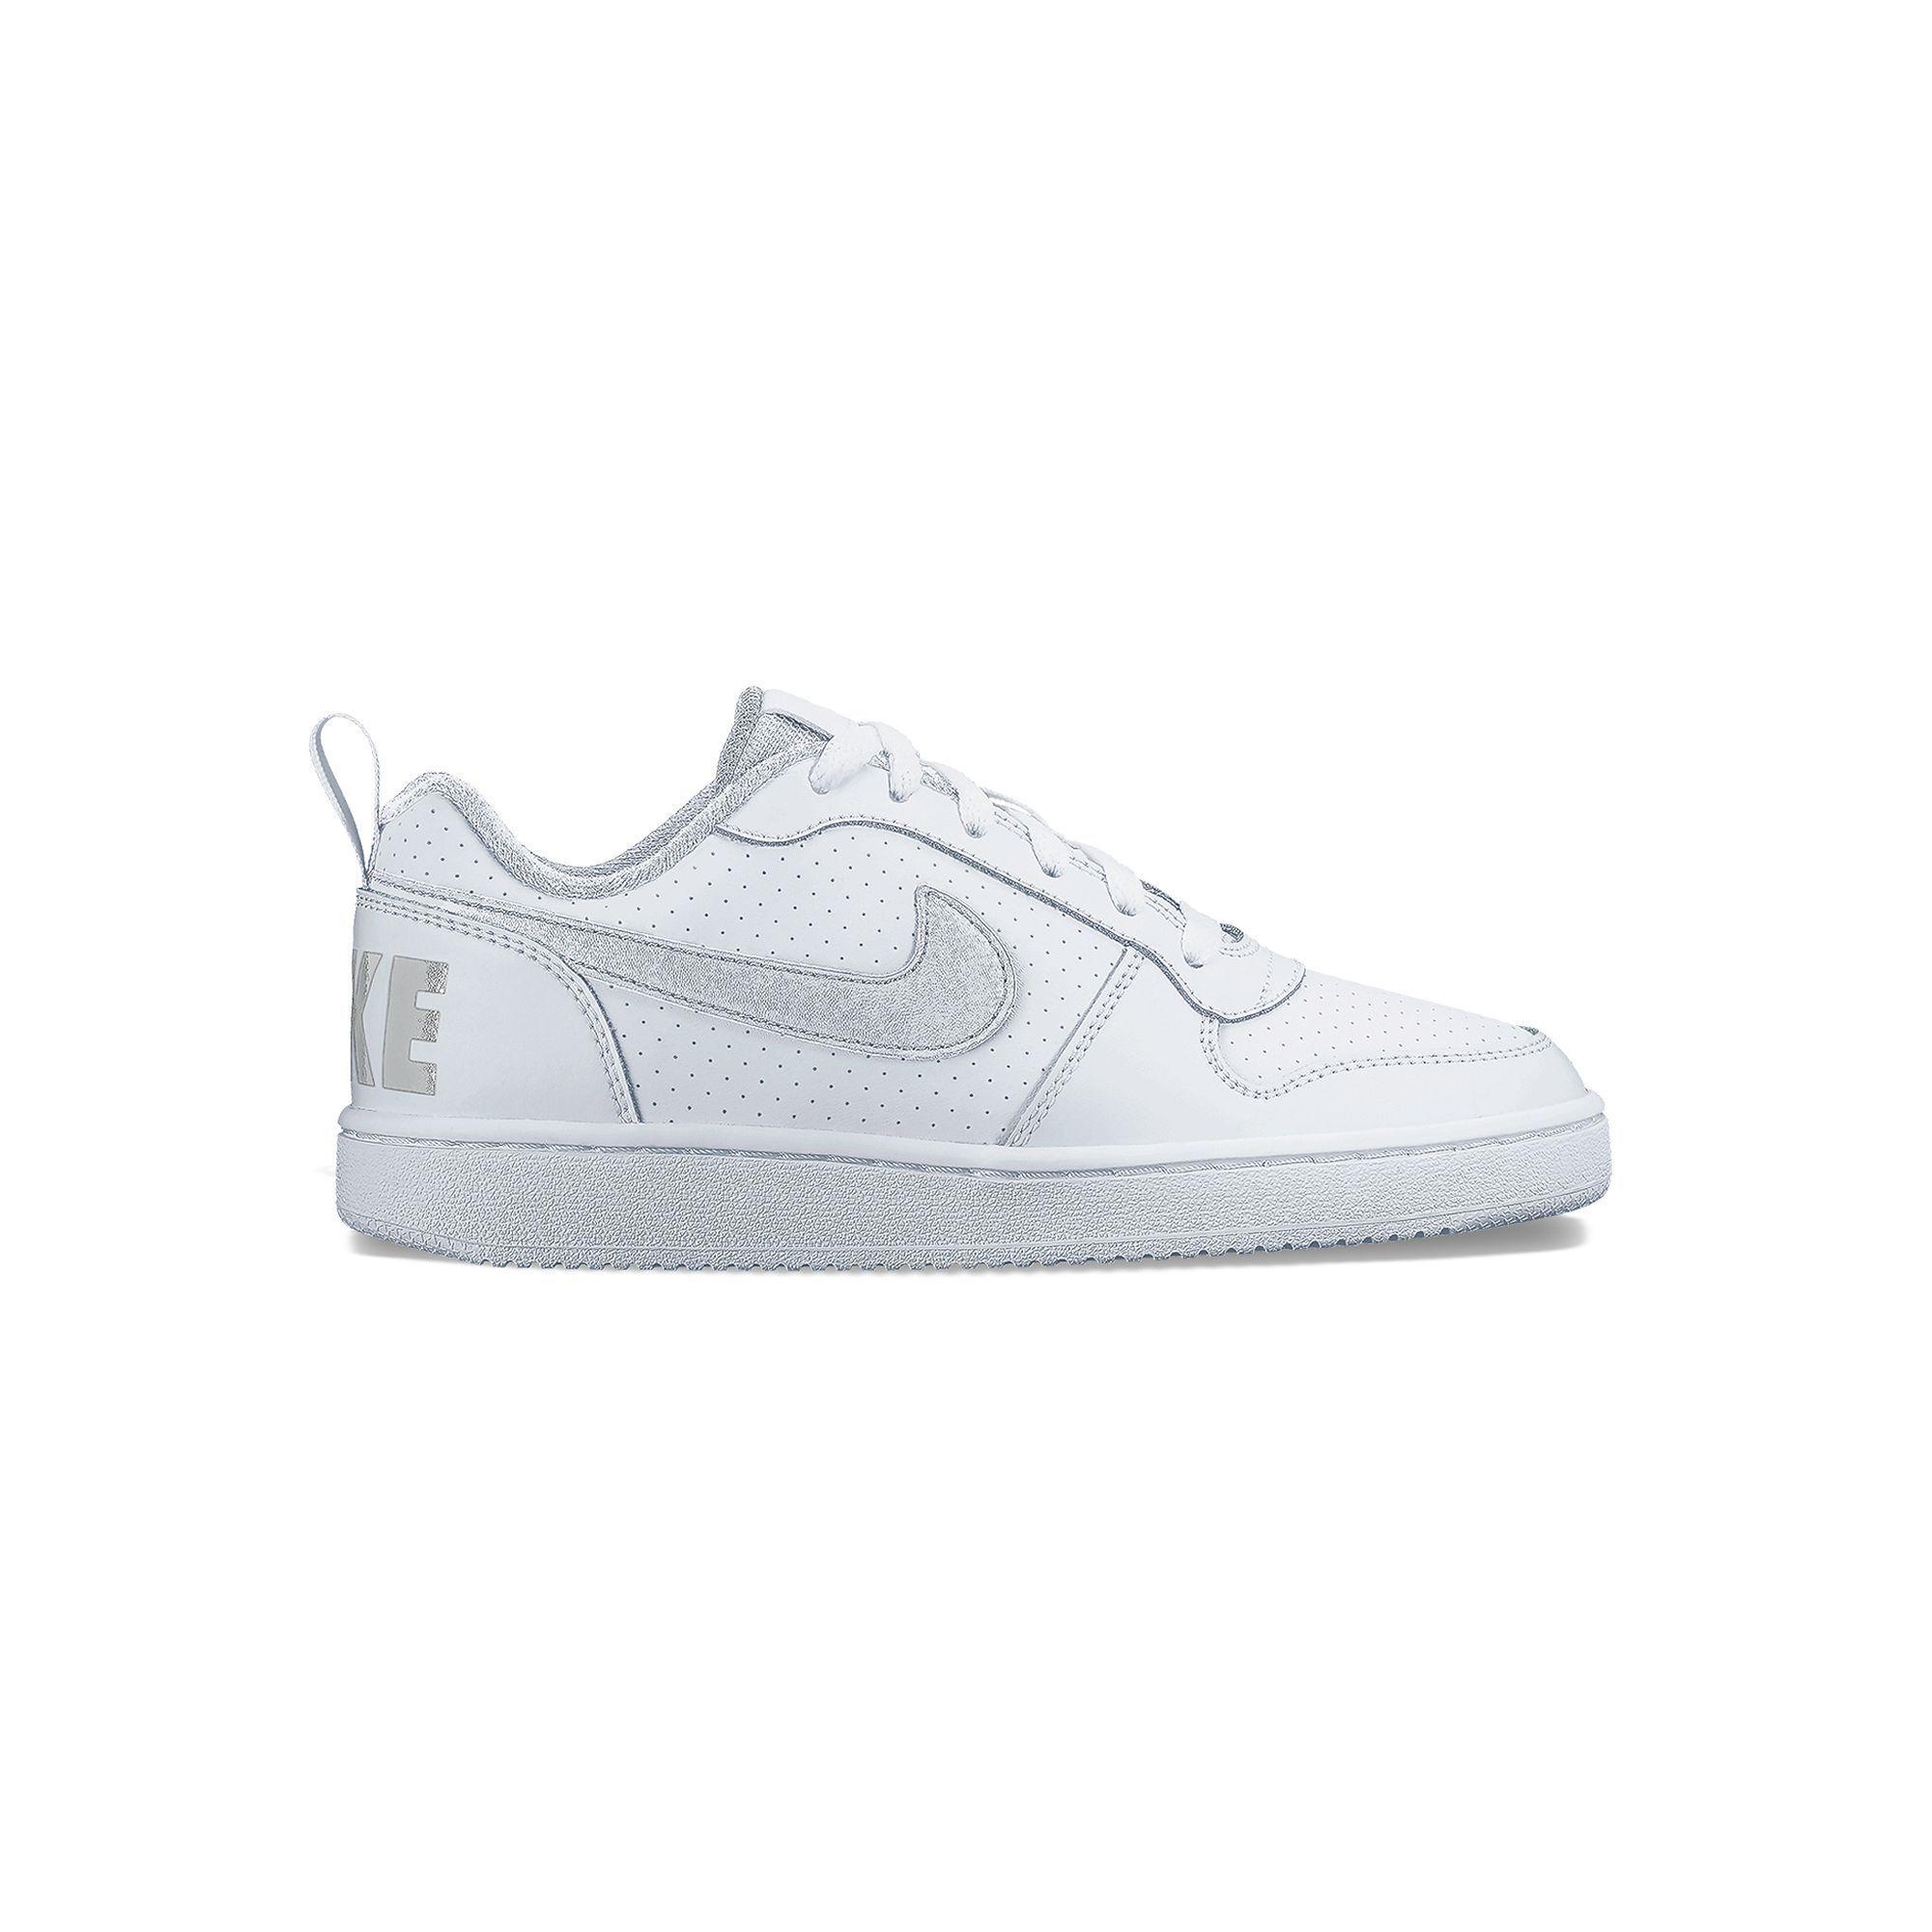 Nike Court Borough Low Grade School Boys' Shoes, Boy's, Size: 5, White